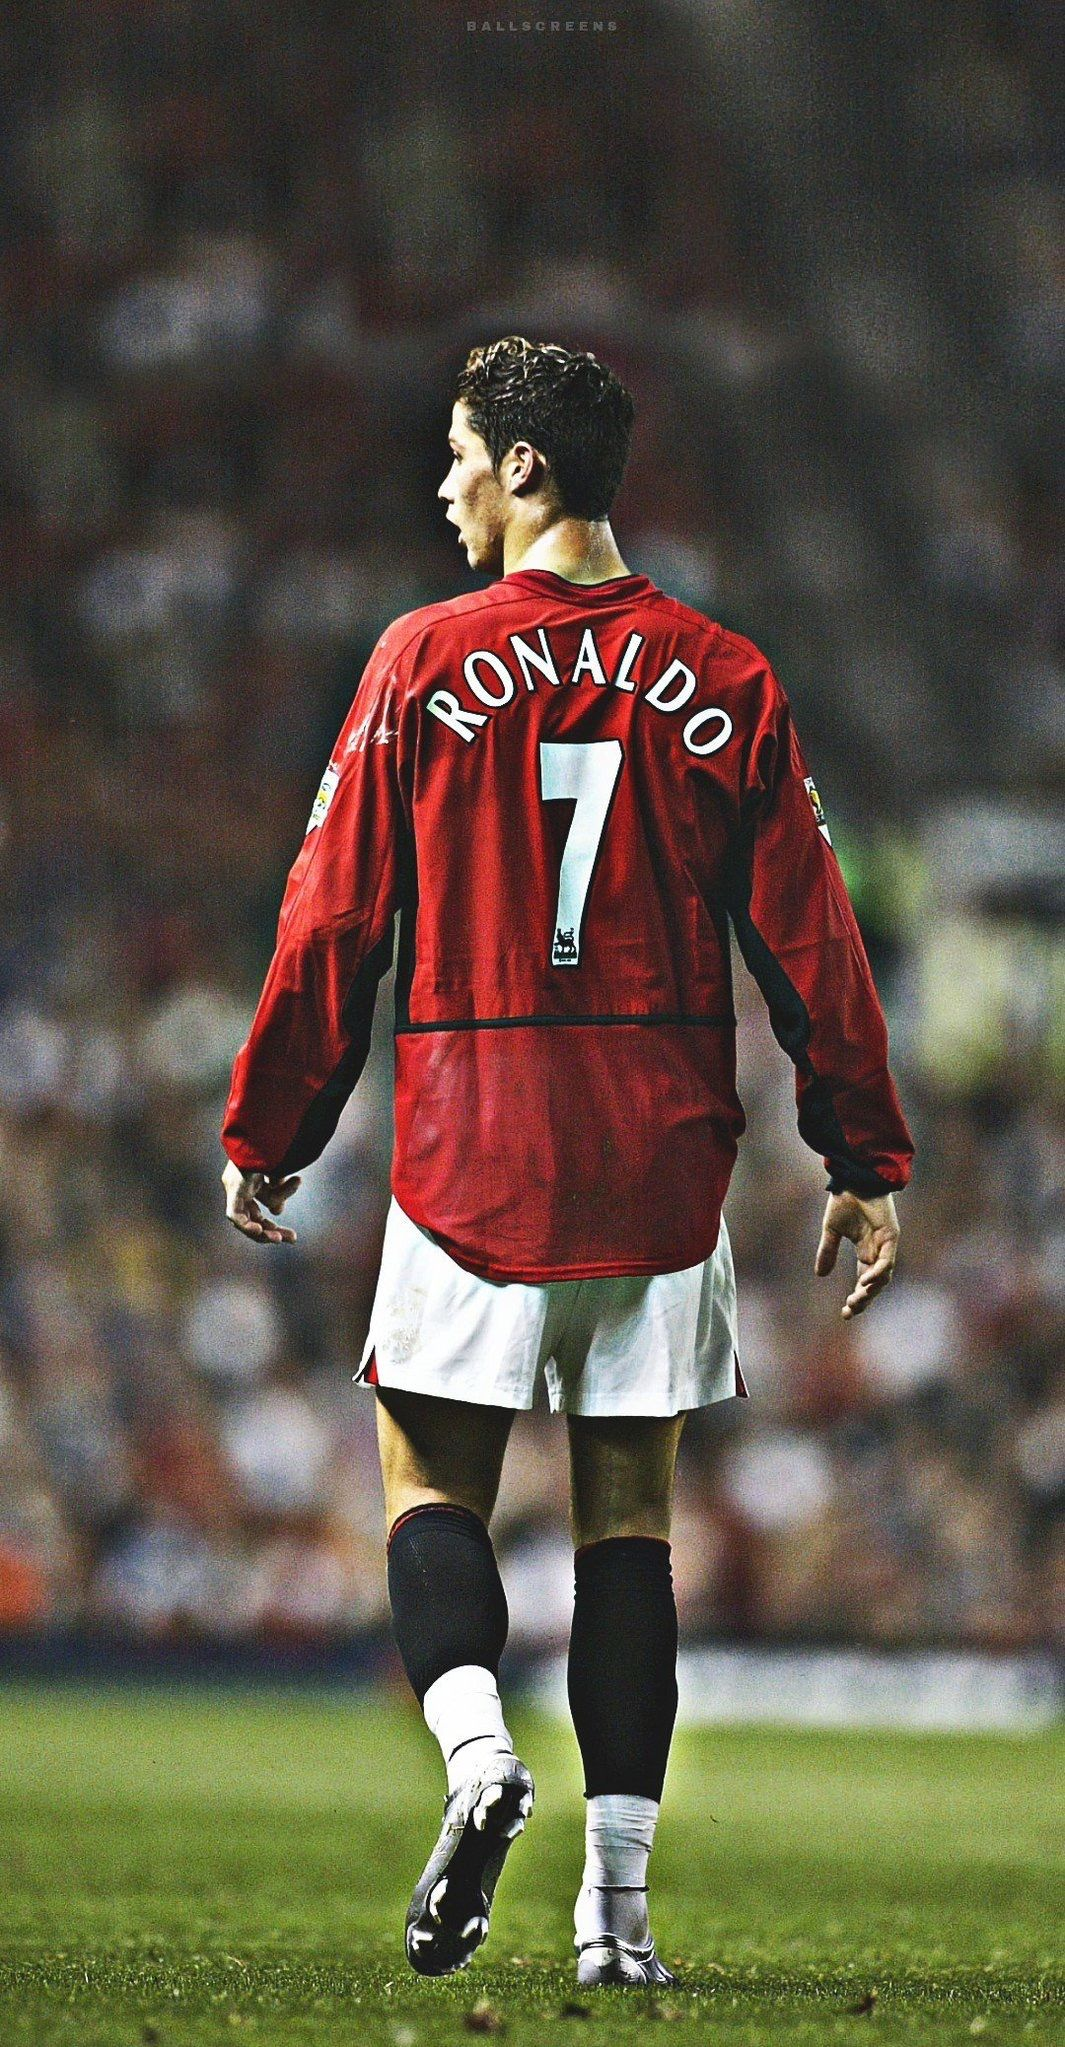 Manchester United | Cristiano ronaldo manchester, Messi vs ronaldo